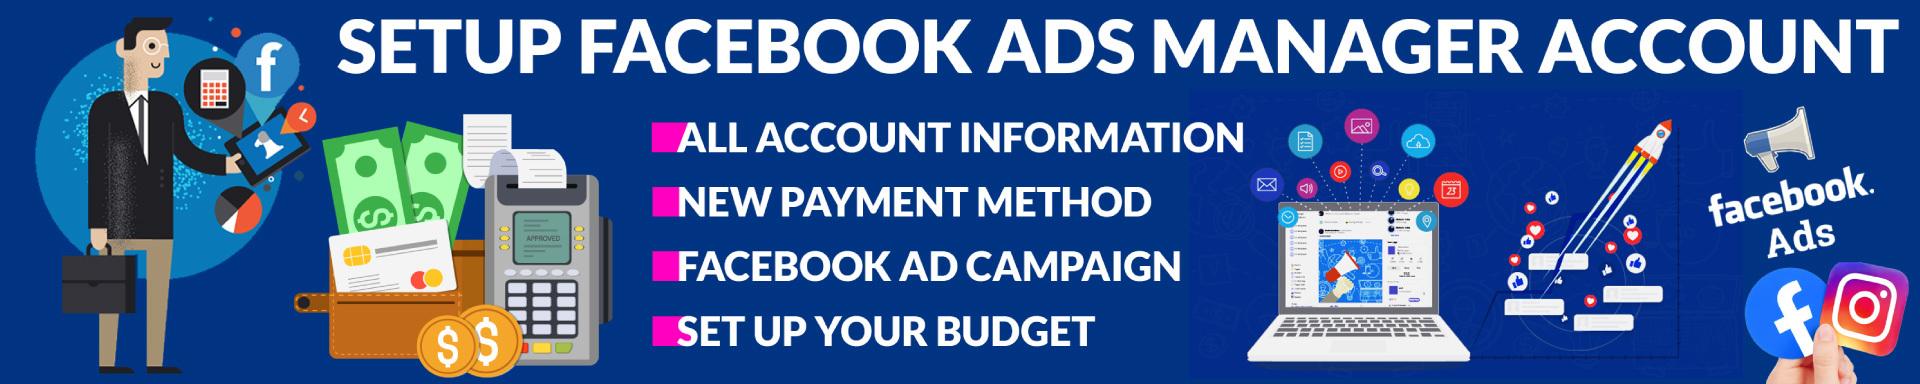 Banner Setup Facebook Ads Manager Account